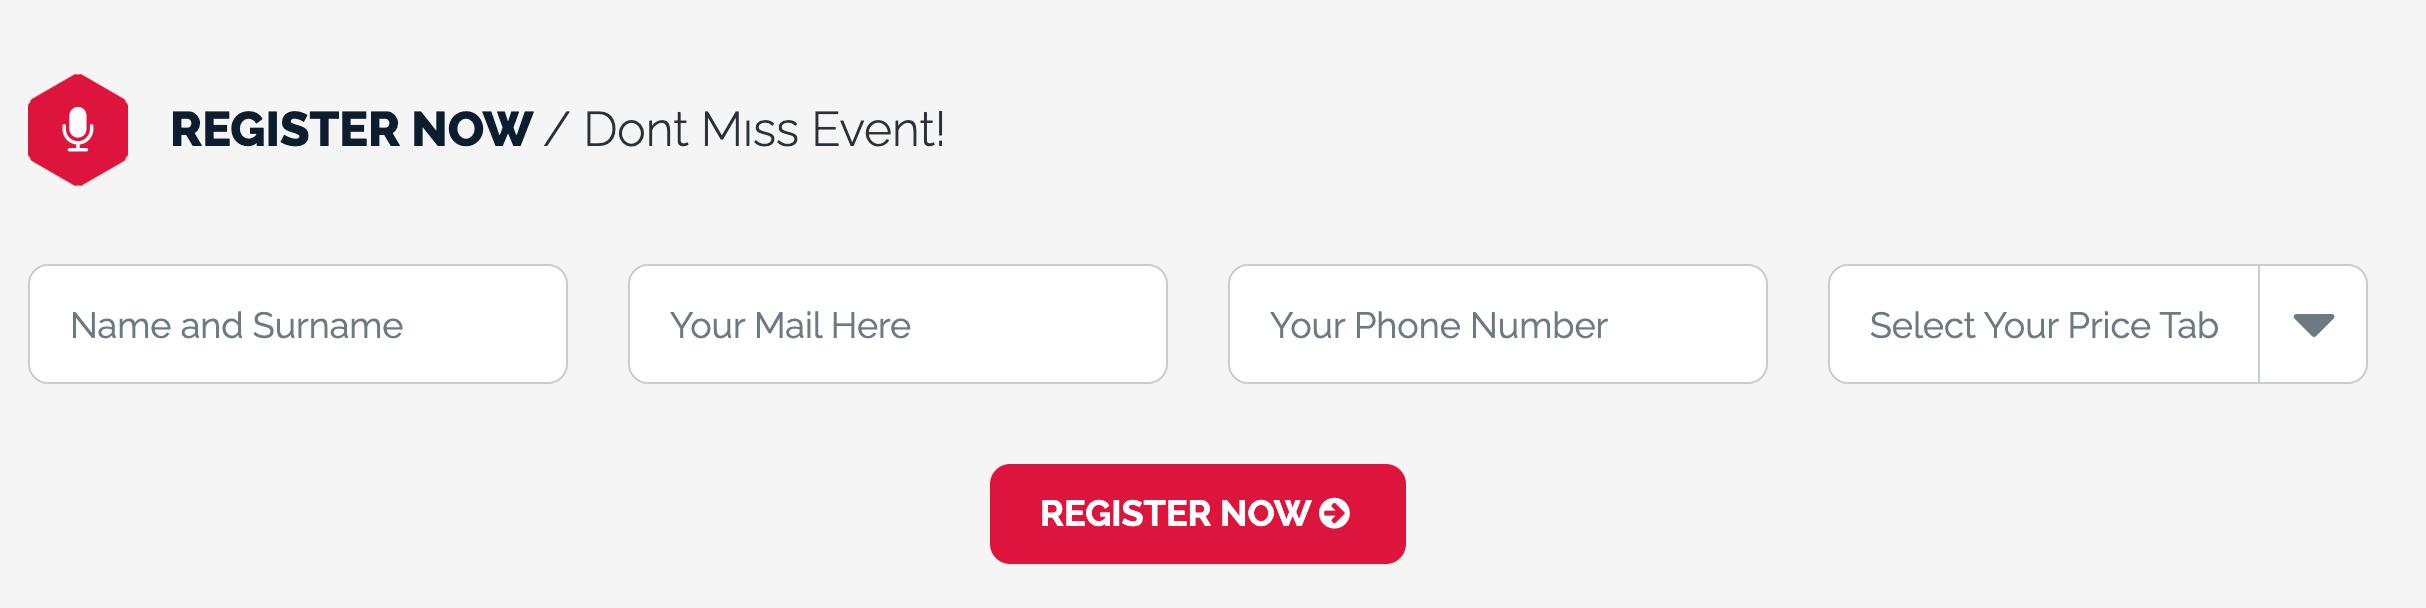 Virtual Event Registrierung durch Website Pop-Up